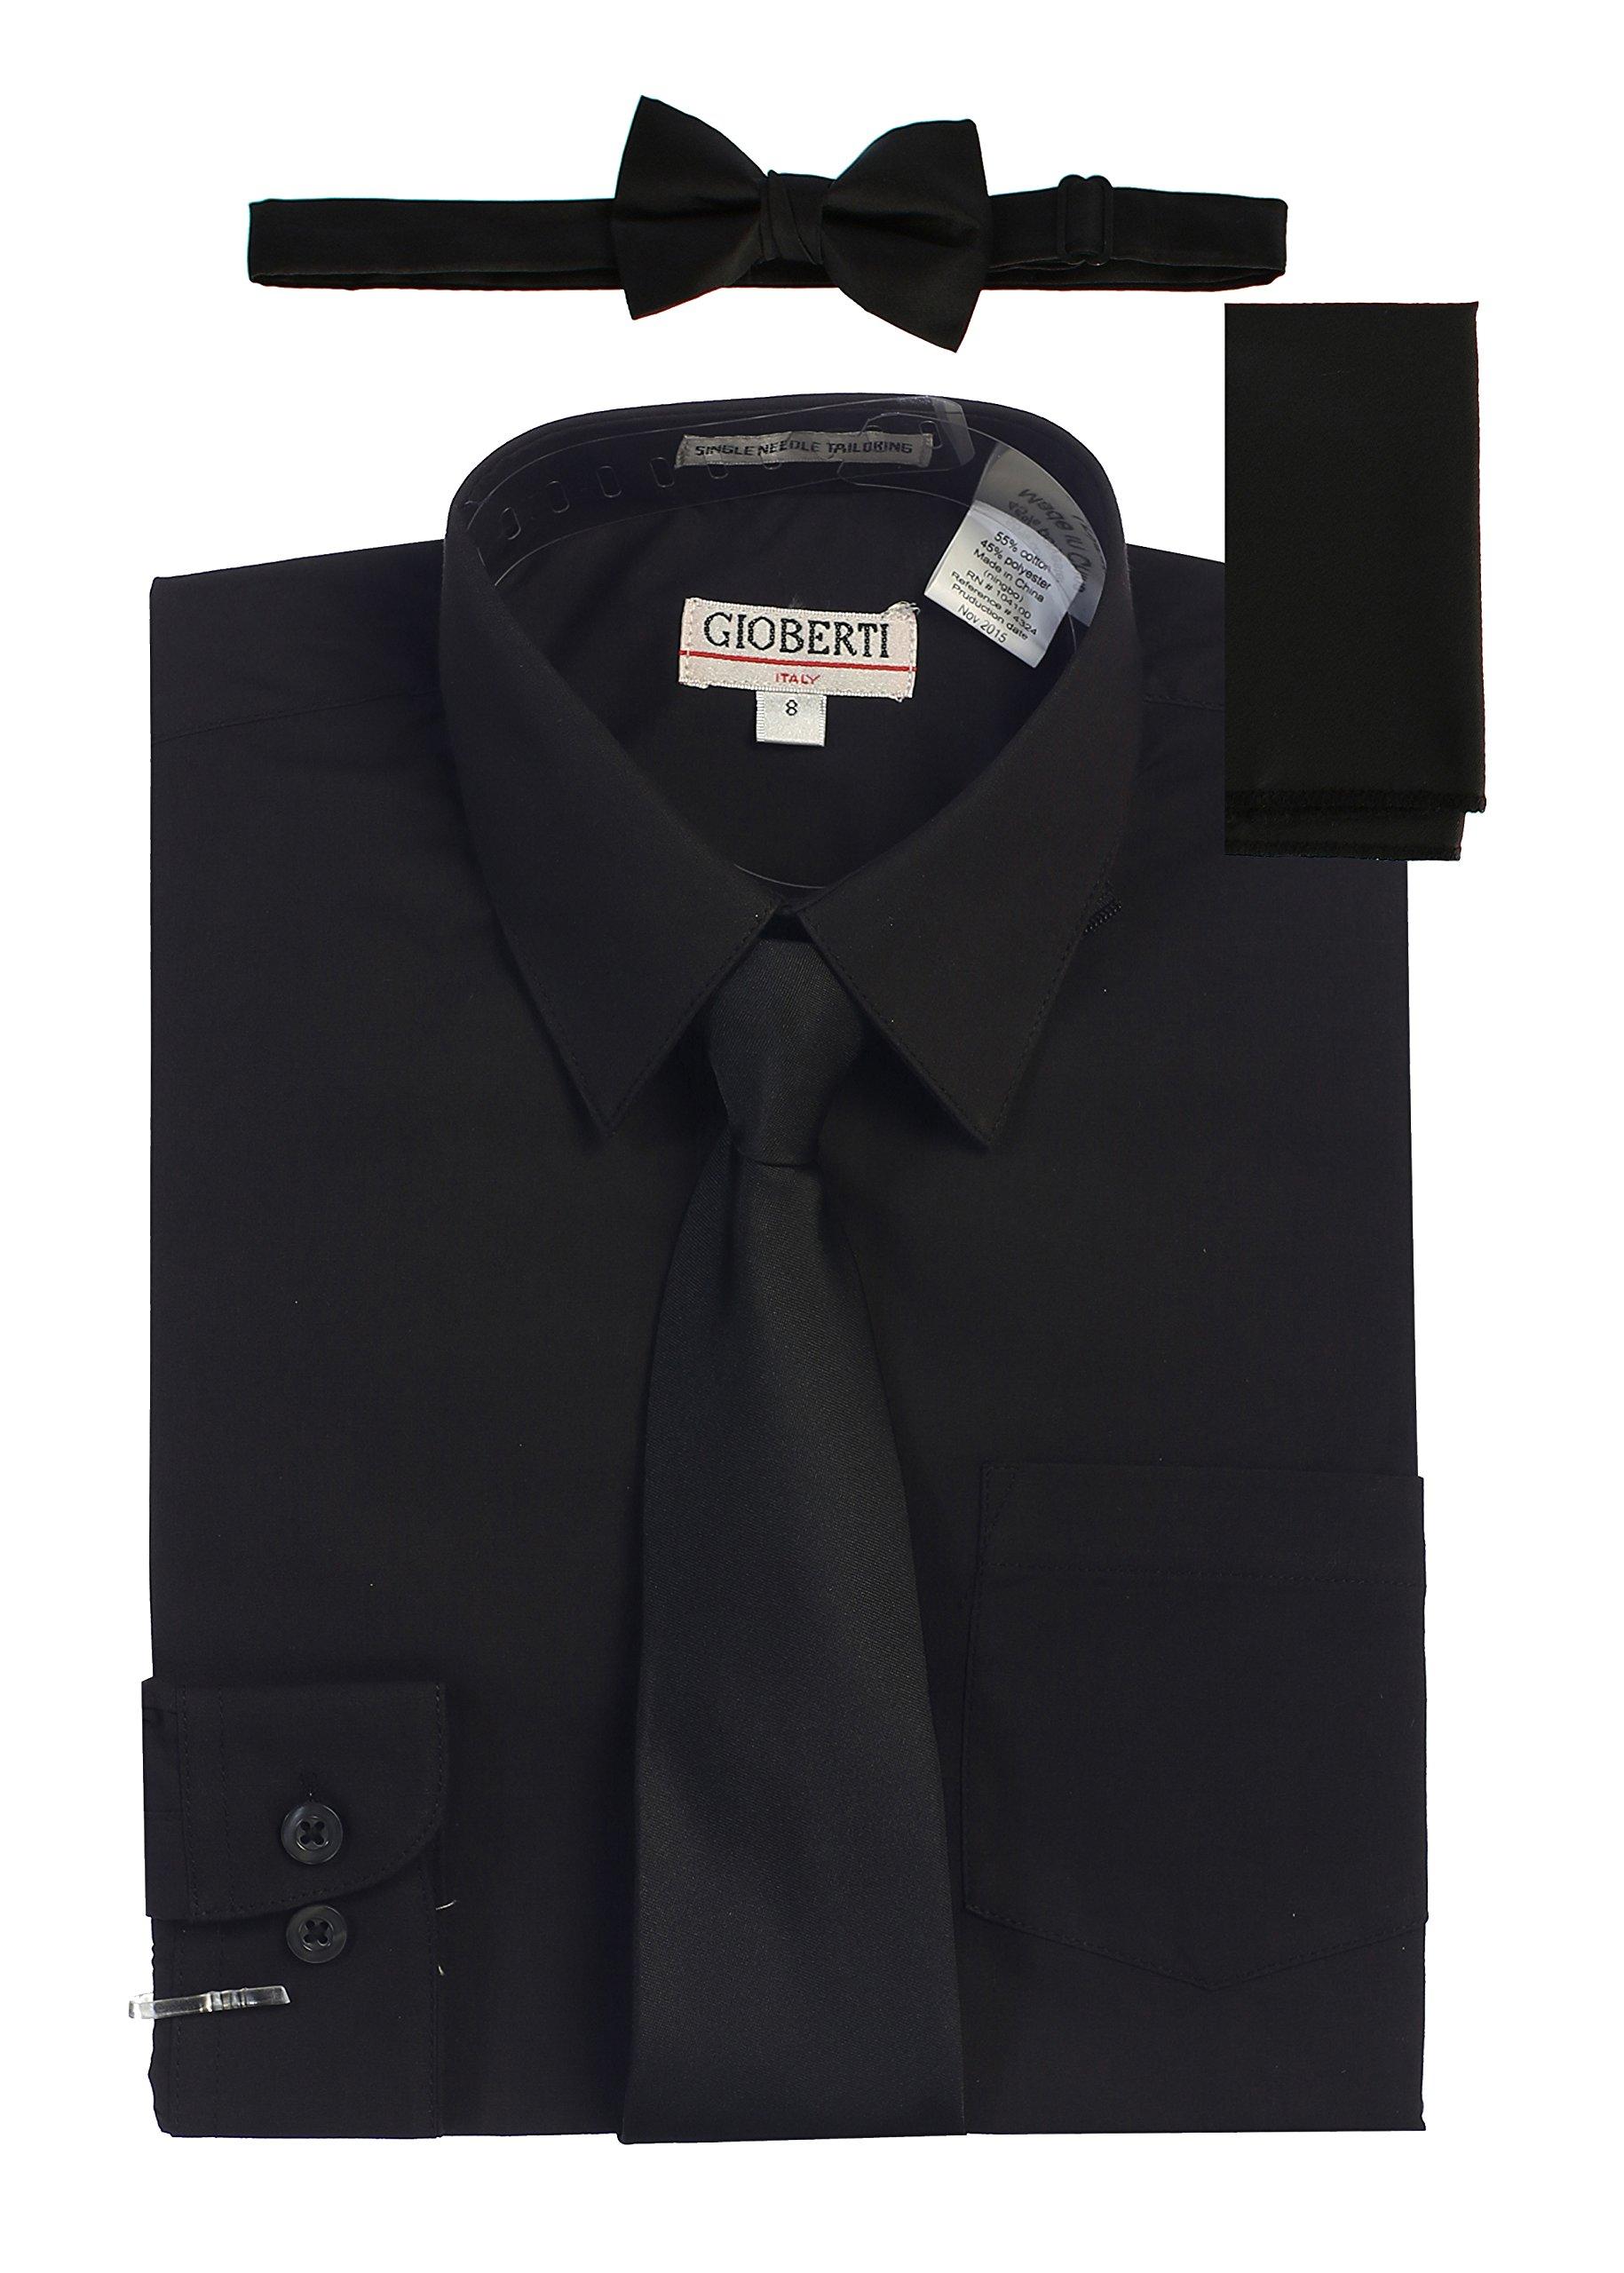 Gioberti Boy's Long Sleeve Dress Shirt with Zippered Tie, Bow Tie, and Handkerchief Set, Black, Size 14